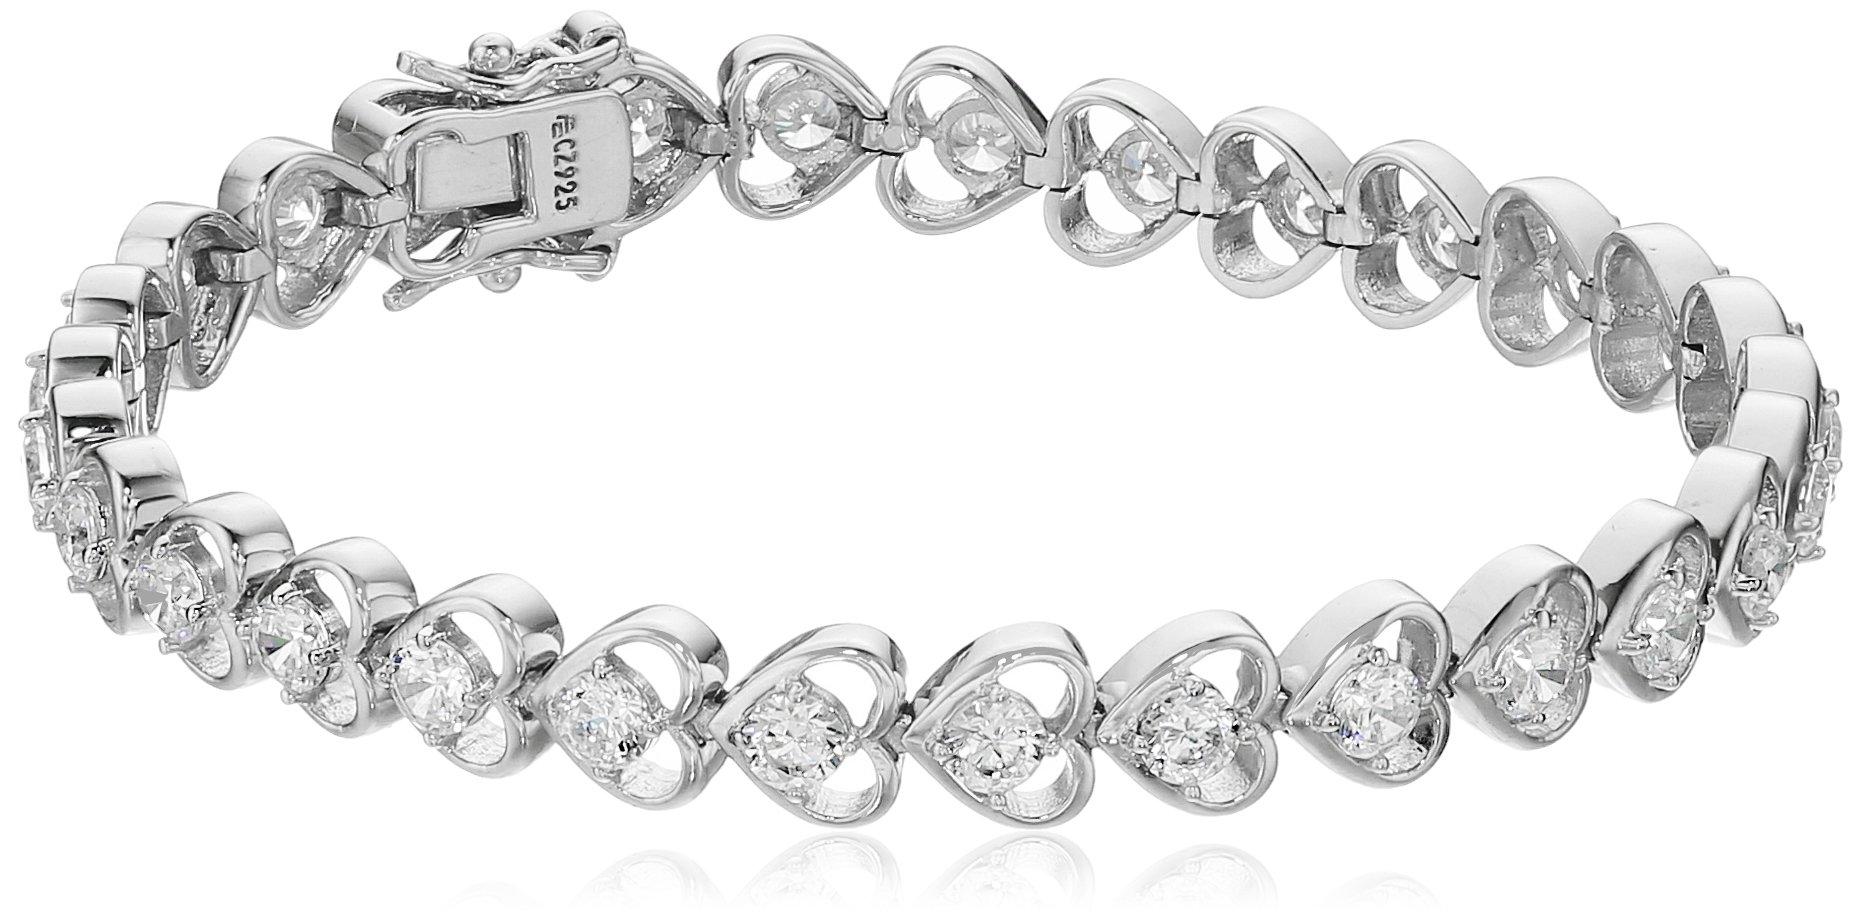 Platinum-Plated Sterling Silver Swarovski Zirconia Heart Tennis Bracelet, 7.5''